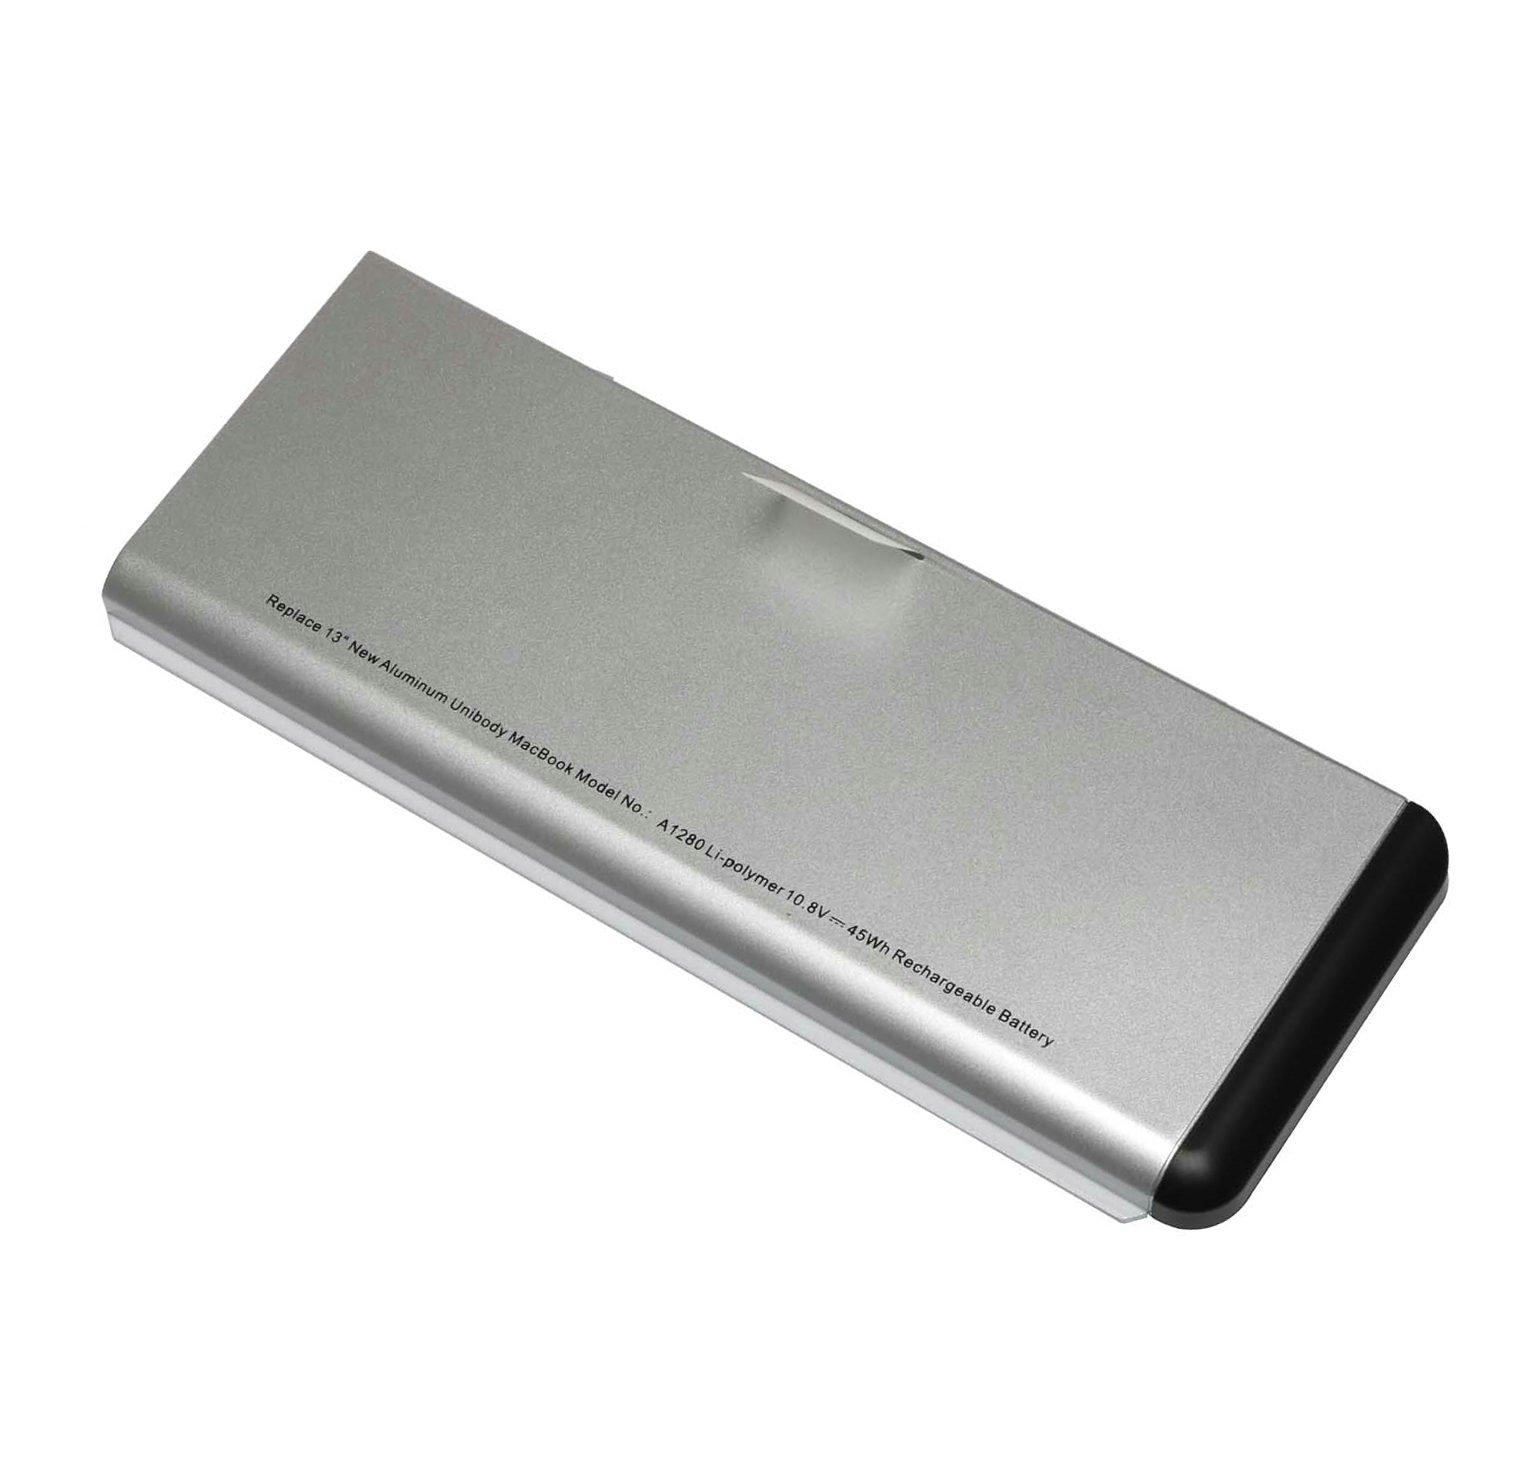 Elecbrain® 45WH Laptop Battery for Apple A1278 A1280 (Macbook 13-Inch Late 2008 Aluminum Version) Aluminum Unibody MB467LL/A / MB466LL/A